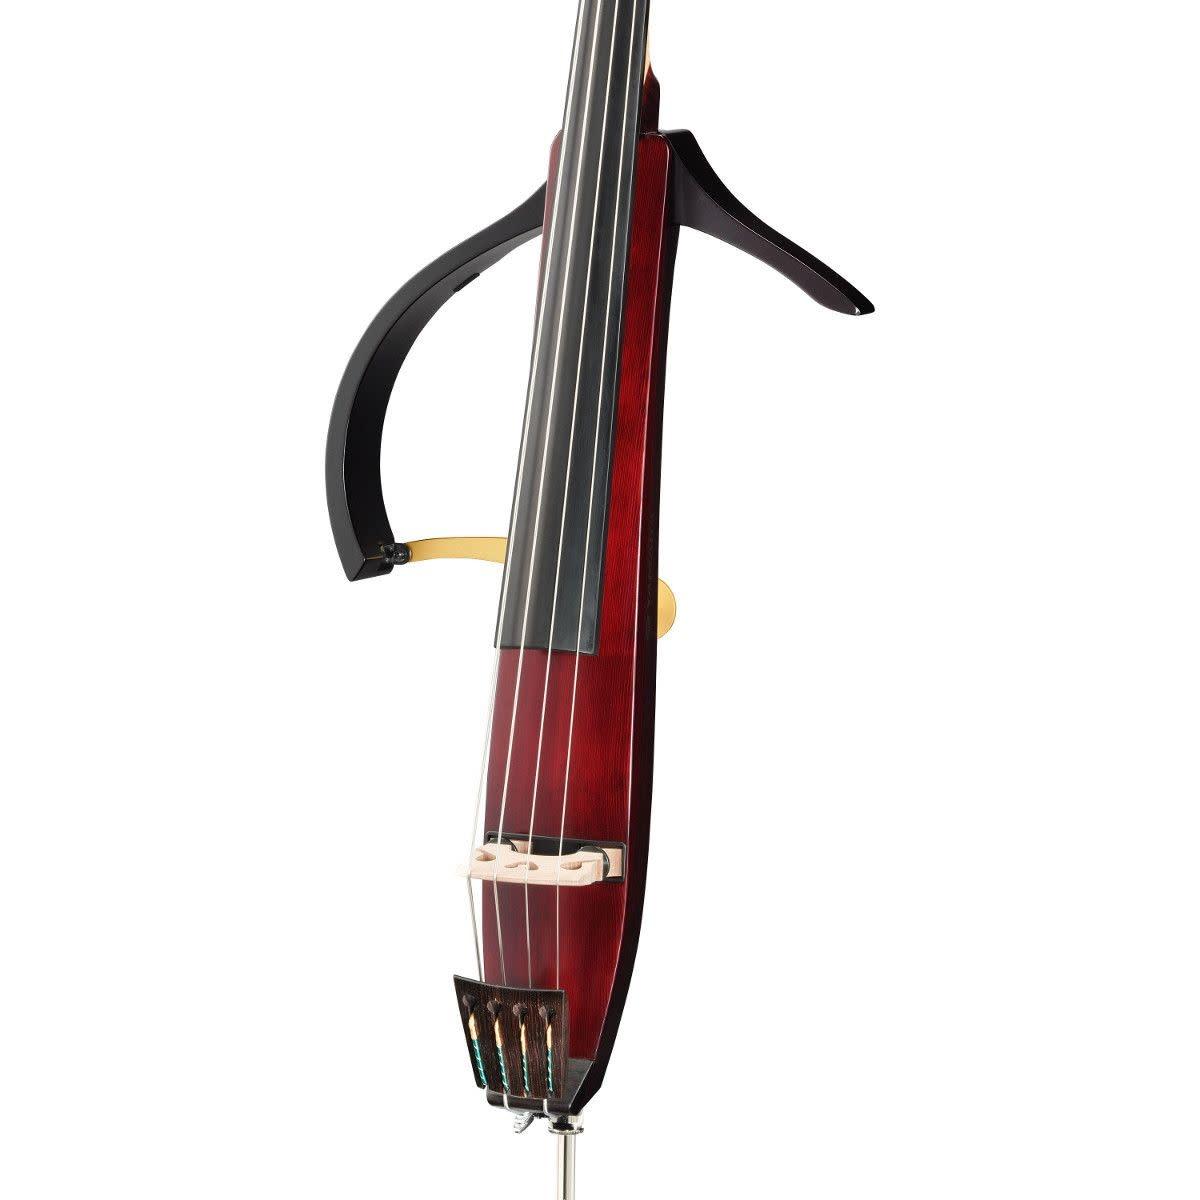 Yamaha Yamaha SLB-200LTD Silent Bass™ Limited Edition PRO, with bag